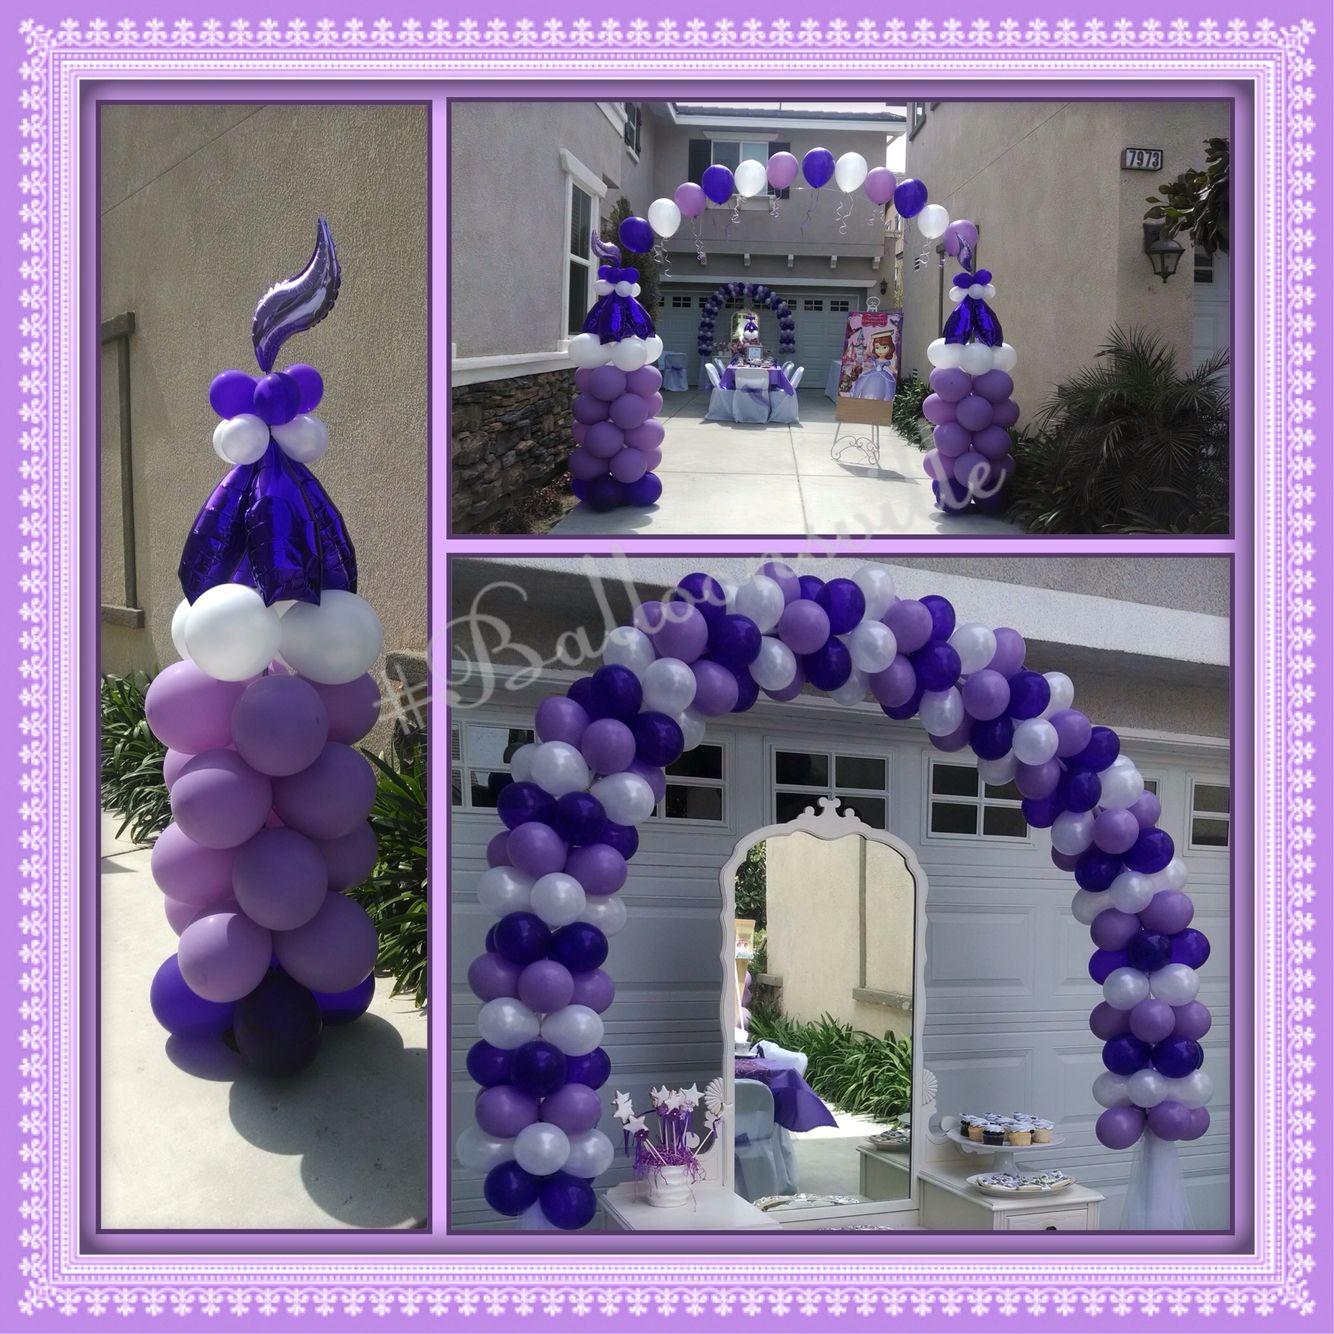 Sofia The 1st Theme Balloon Decor. Lavender, Purple, White